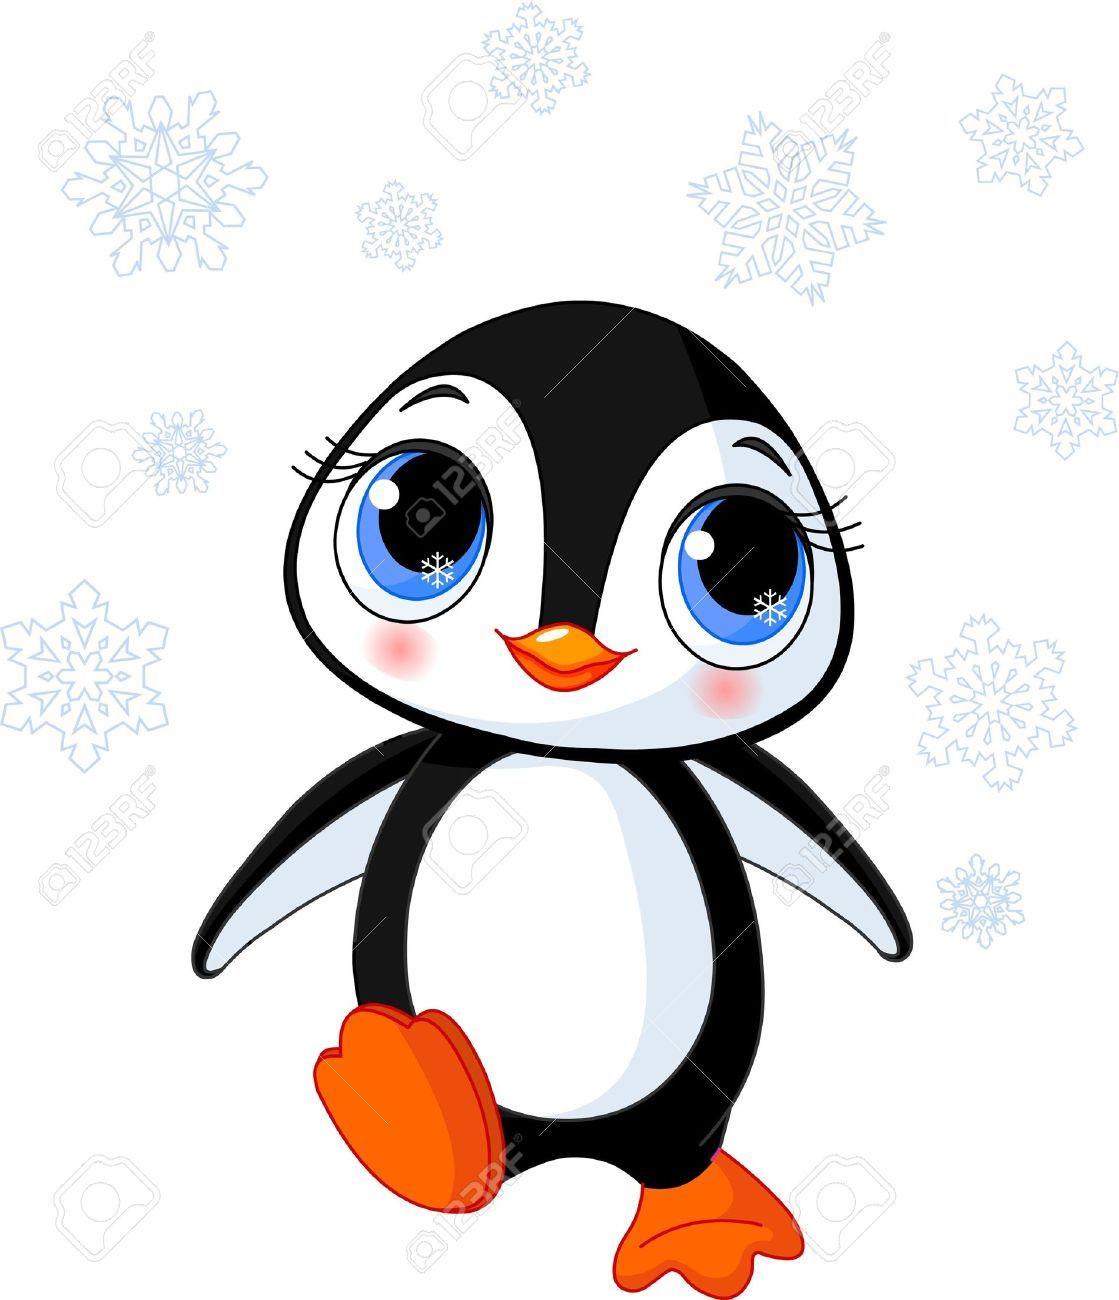 Illustration Of Cute Winter Penguin In Antarctica Royalty ...